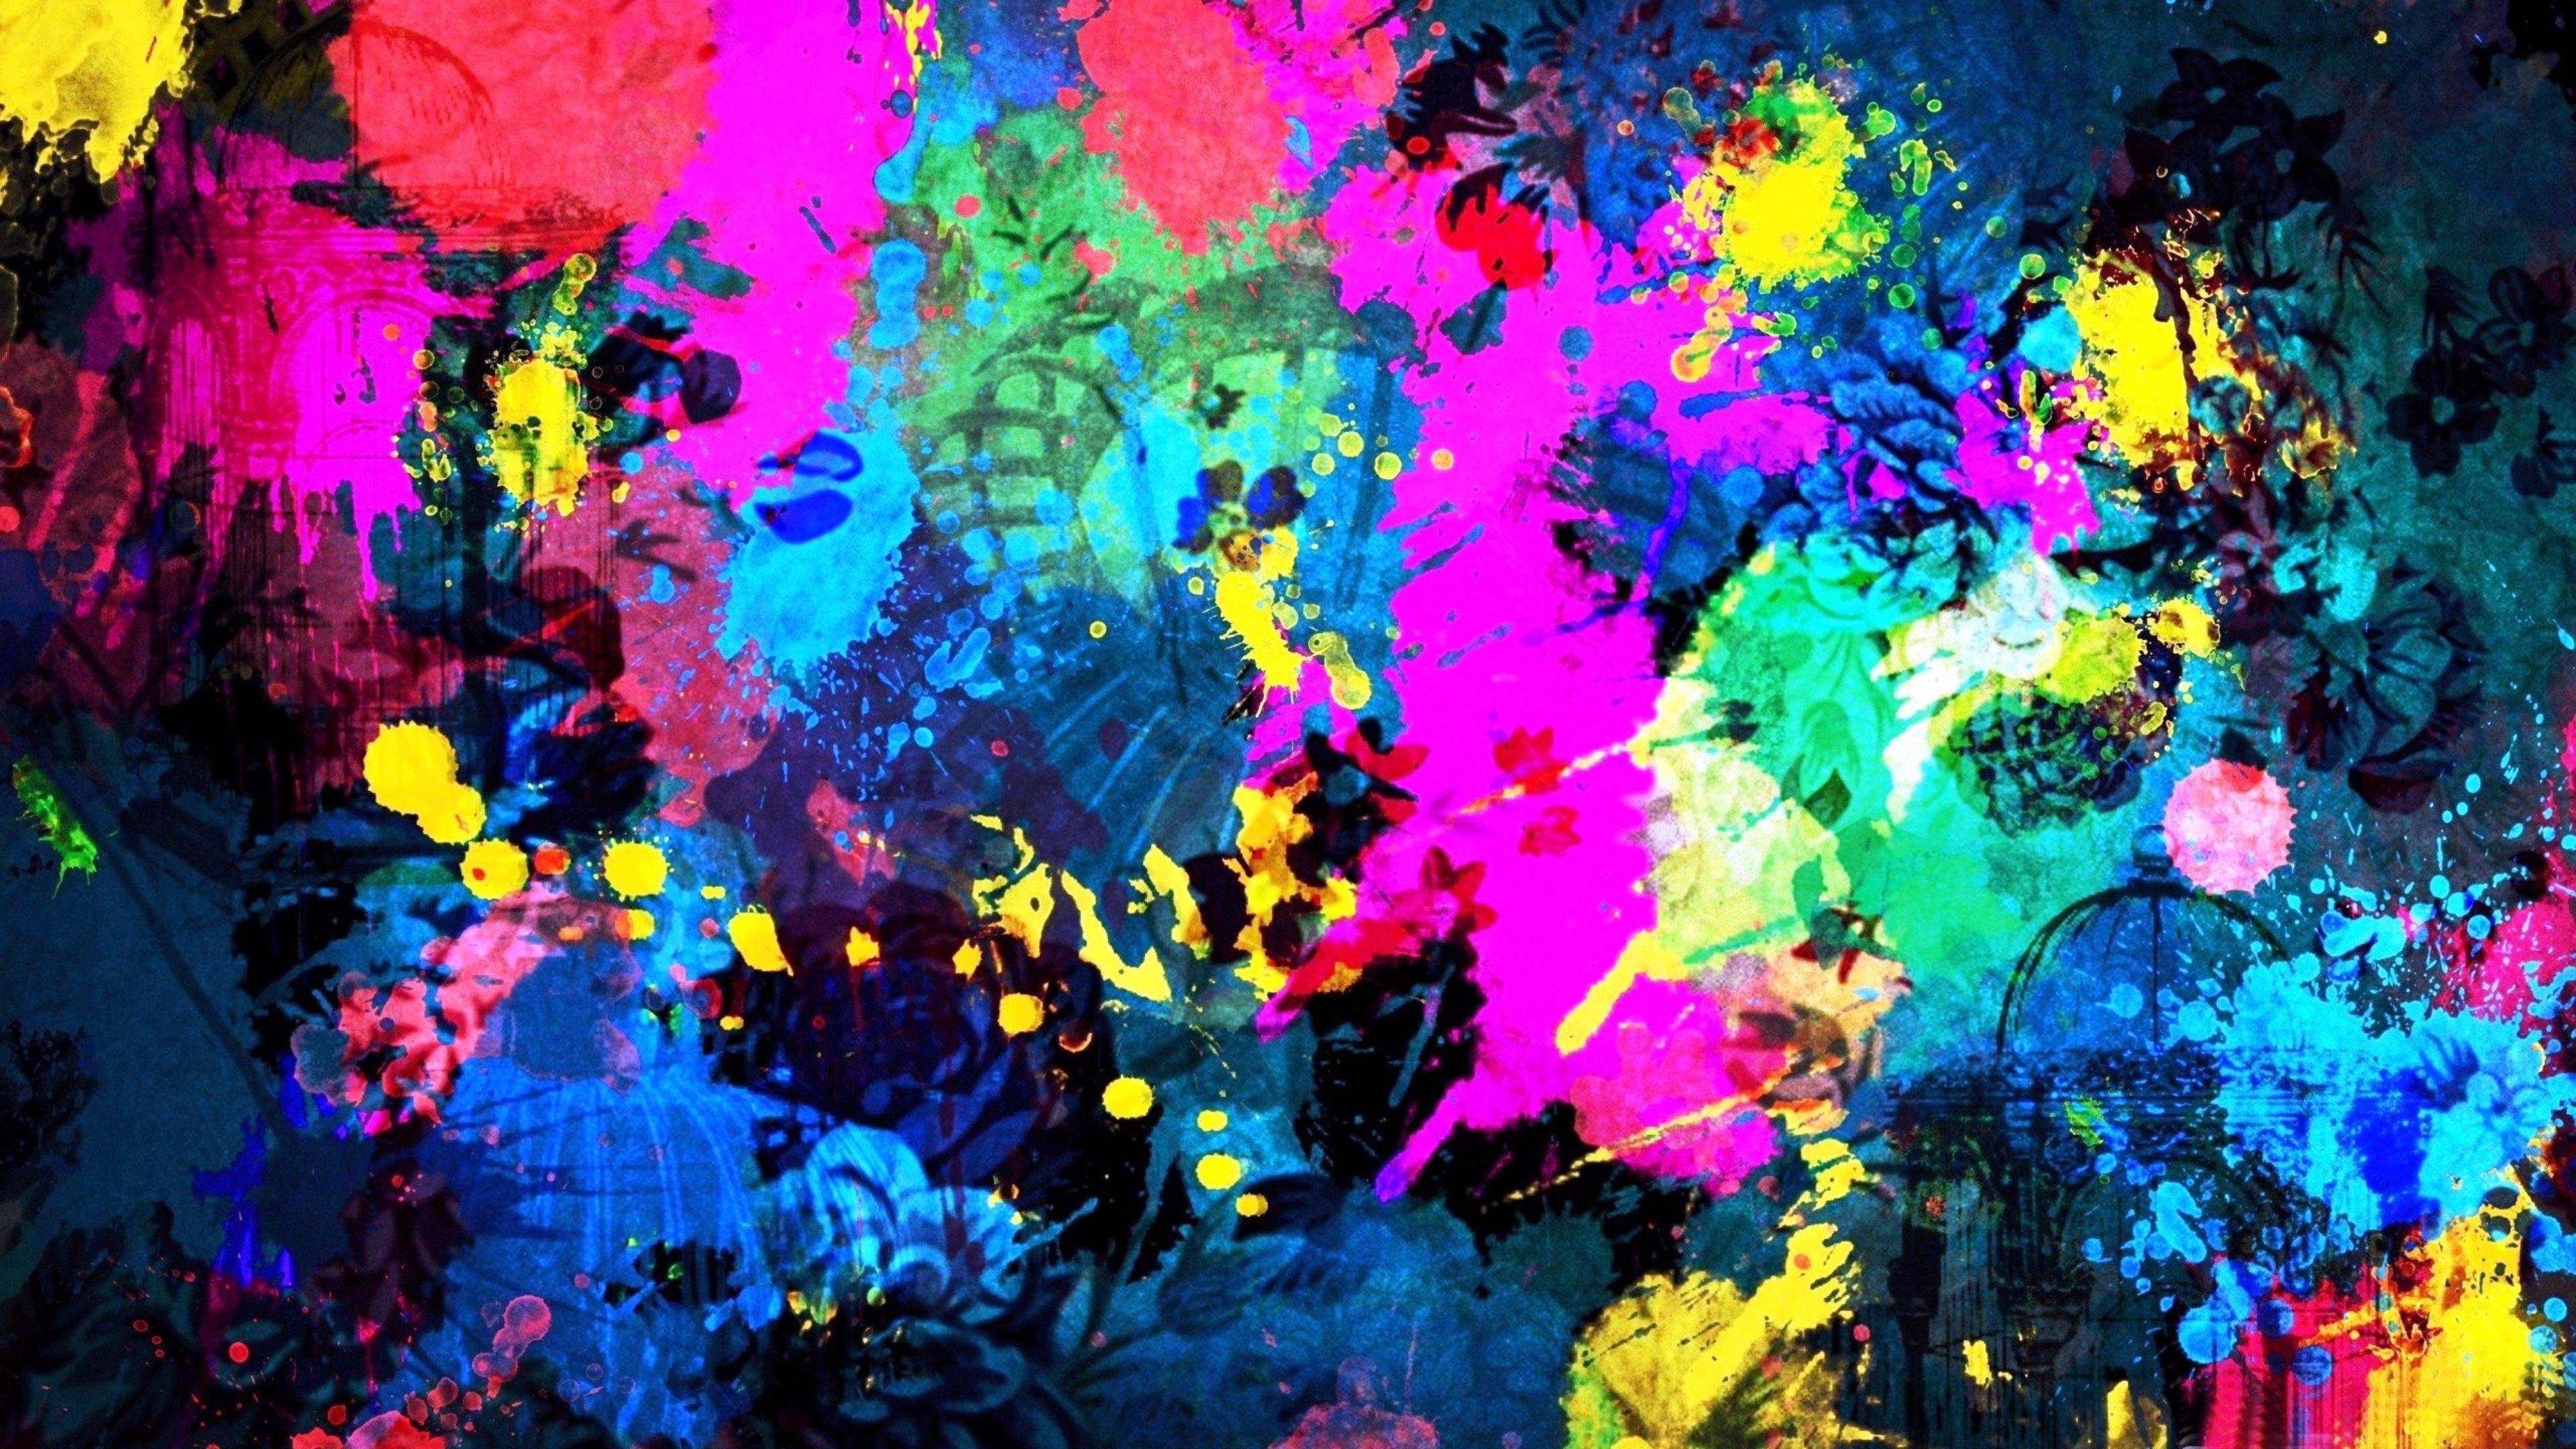 Color Art Abstract 4K Wallpaper 4K Wallpaper 3840x2160